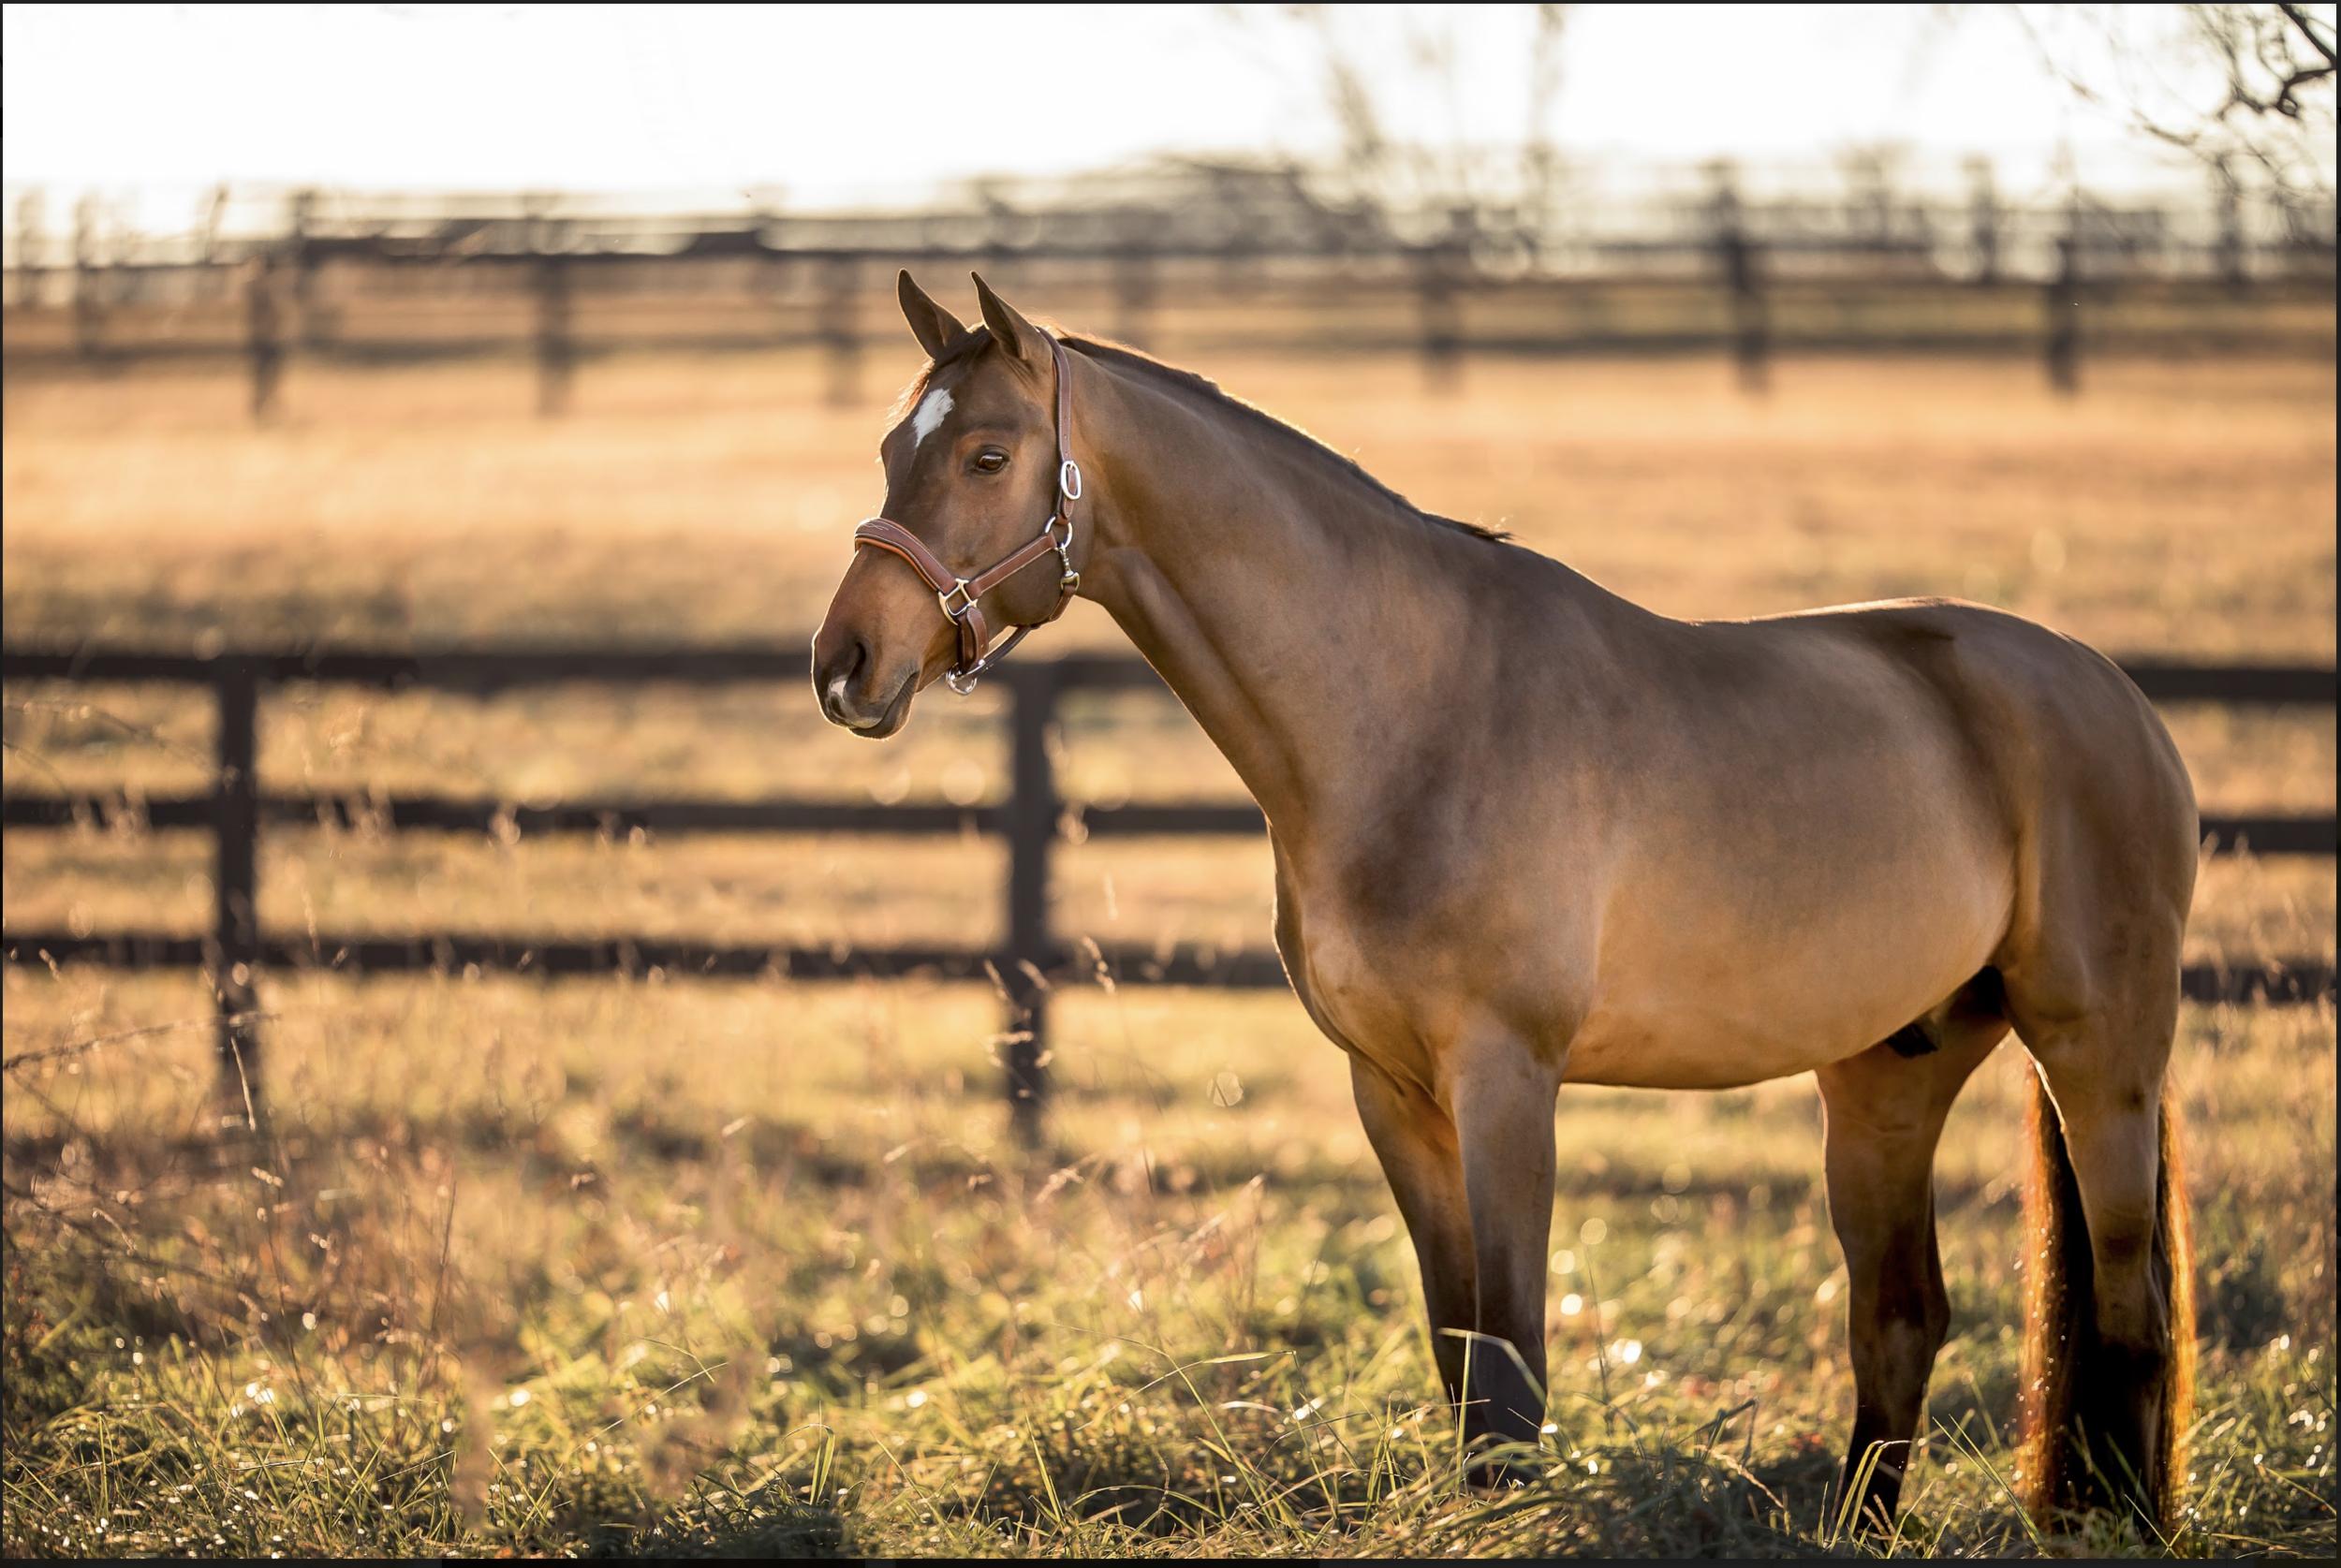 potomac_md_equine_photographer_middleburg_VA_equine_portraits_middletown_MD_photographer.png